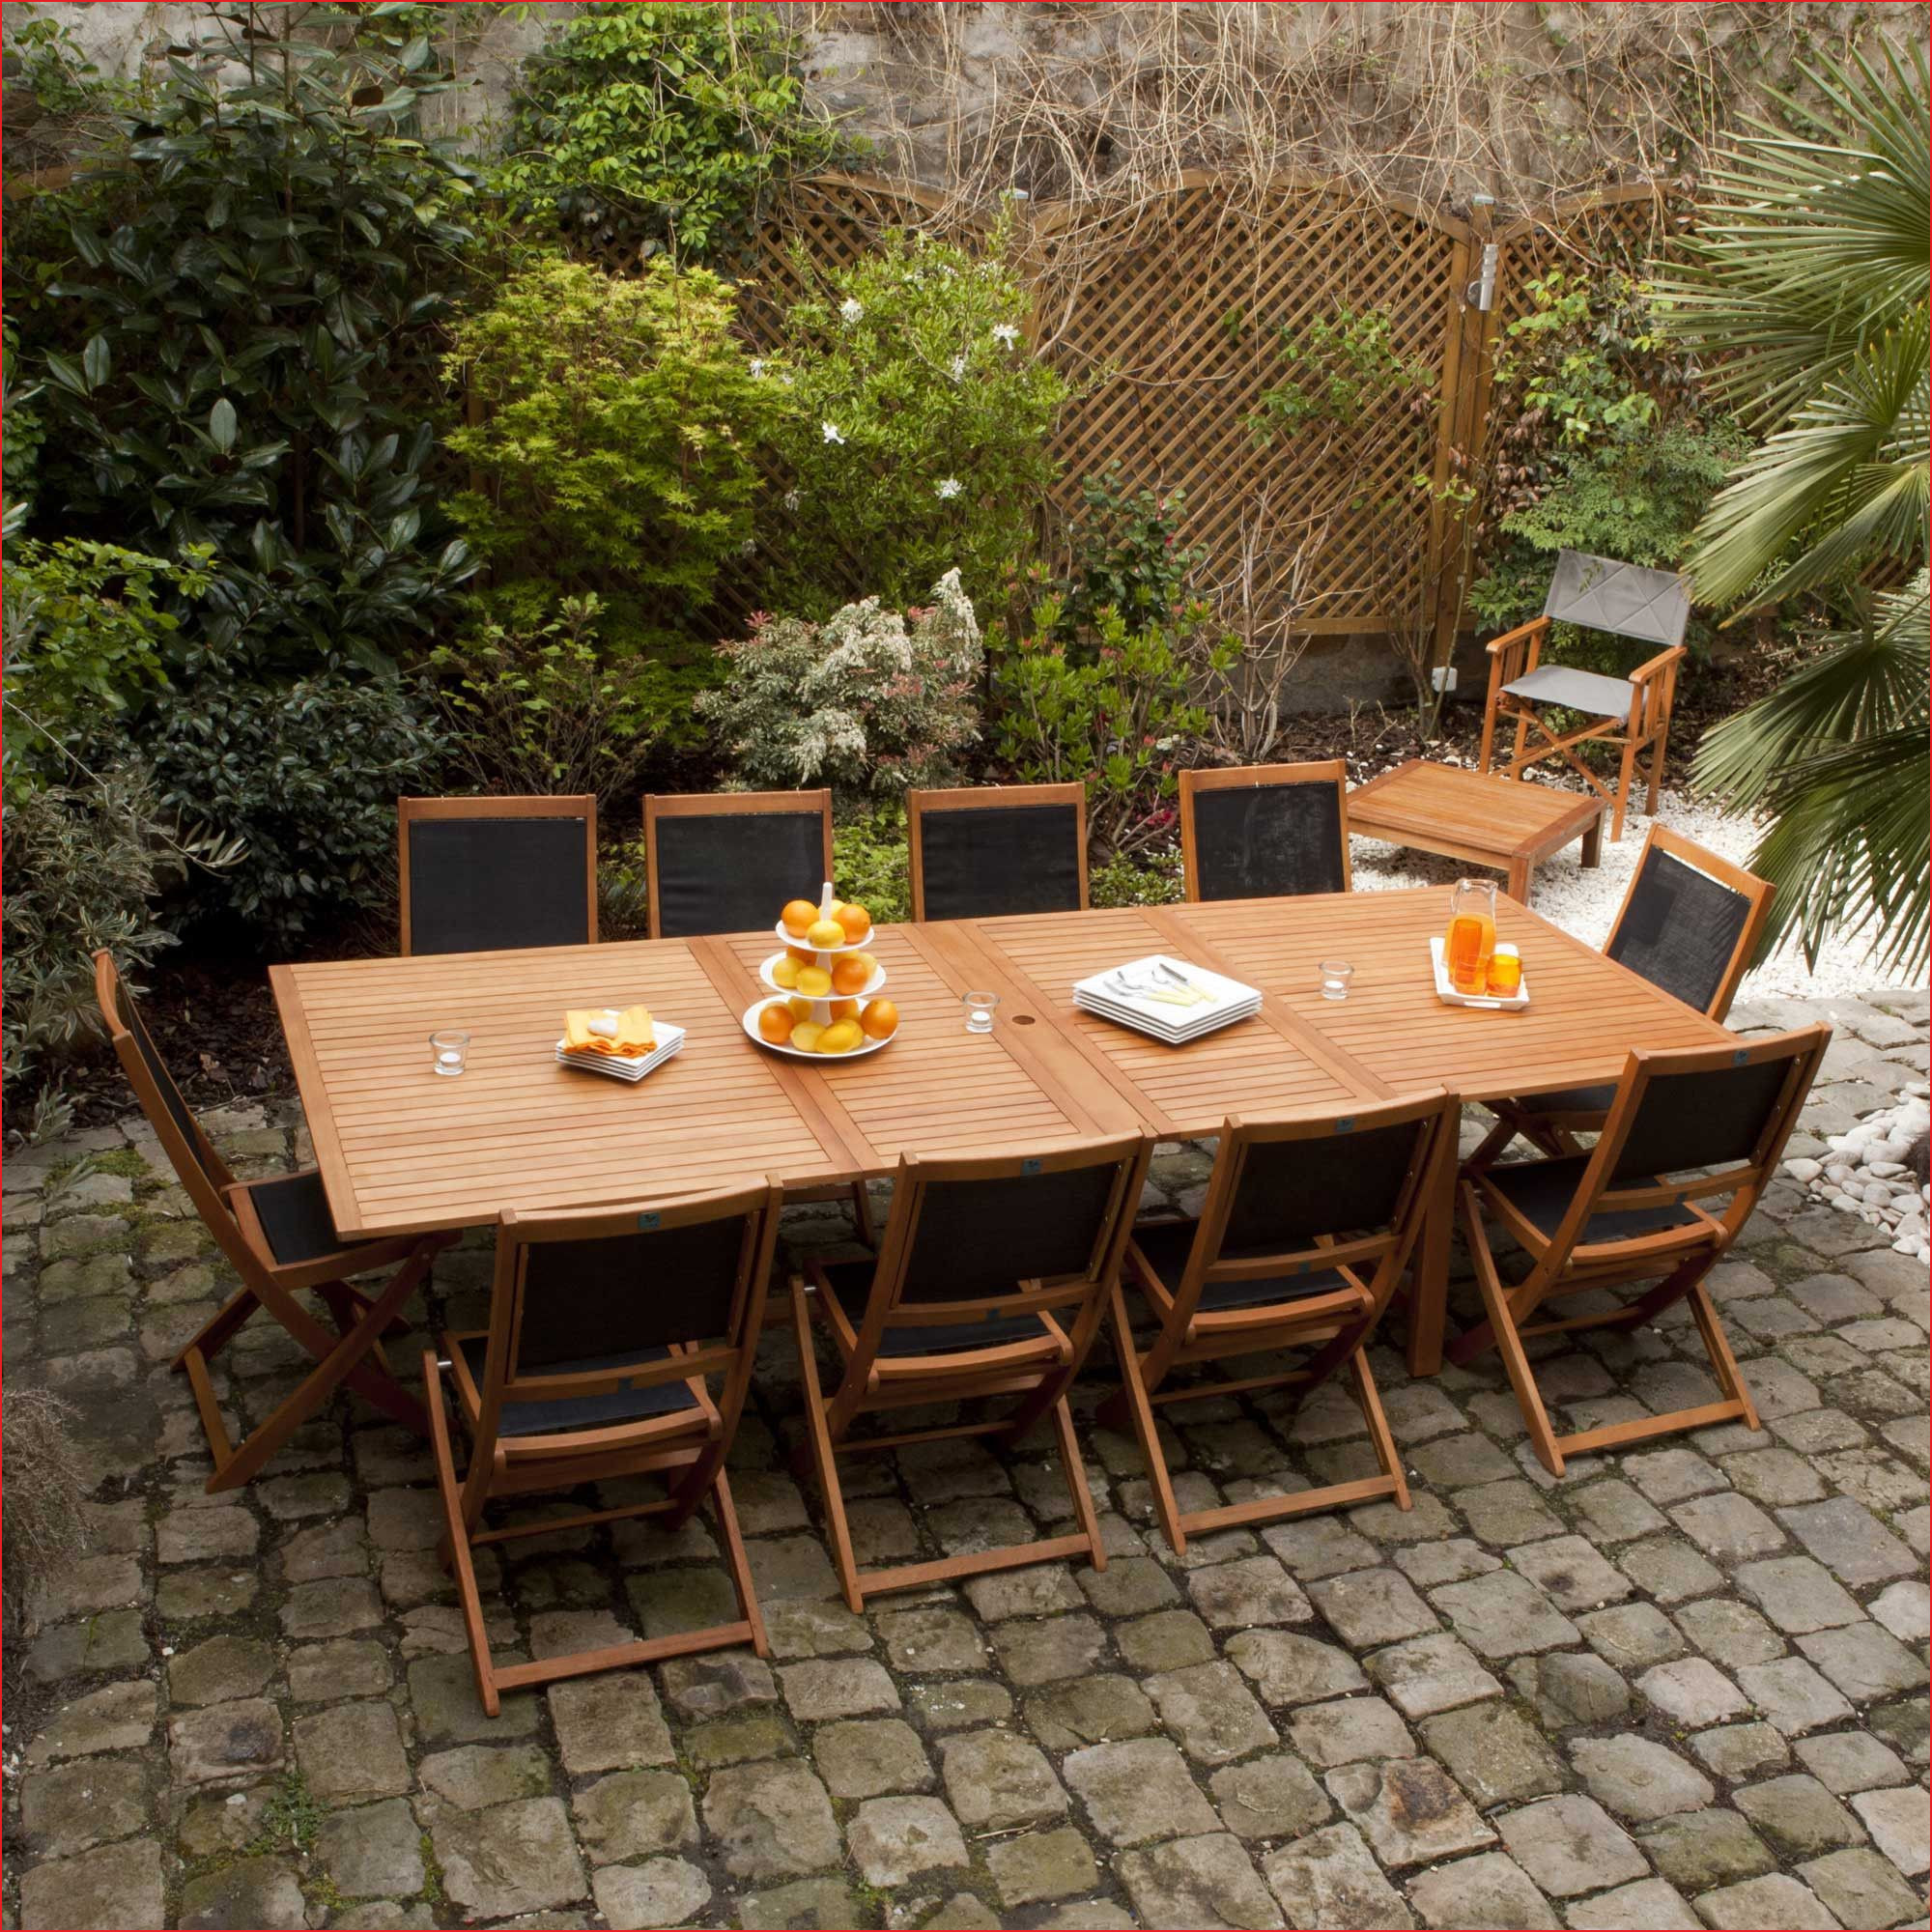 Table Teck Exterieur Best Of Jardin Archives Francesginsberg Of 28 Luxe Table Teck Exterieur